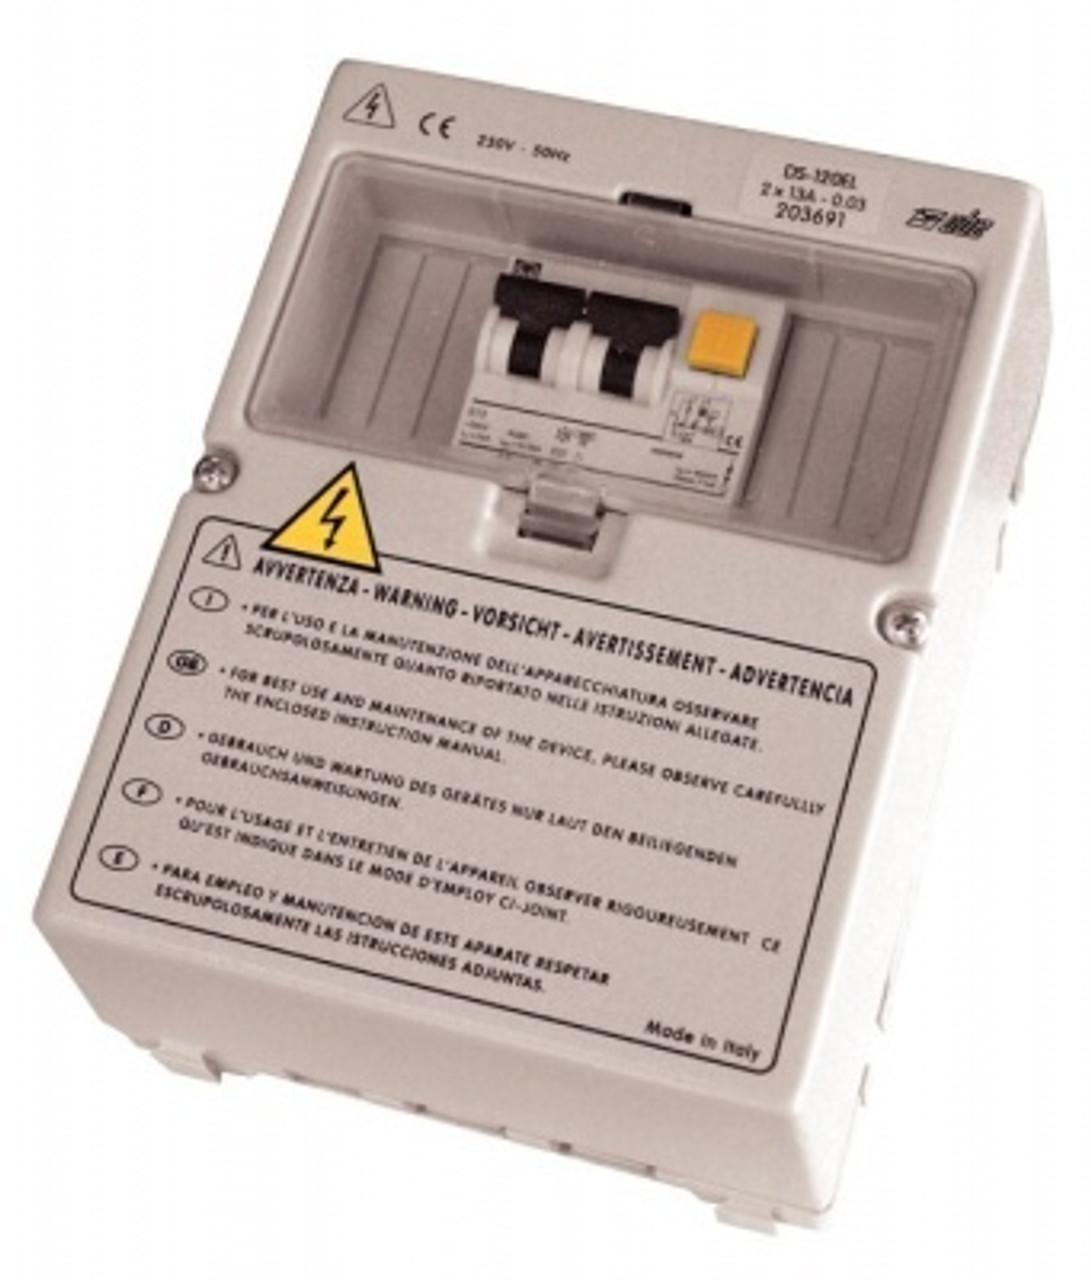 DS300 Campervan Consumer unit for PC210 Kit